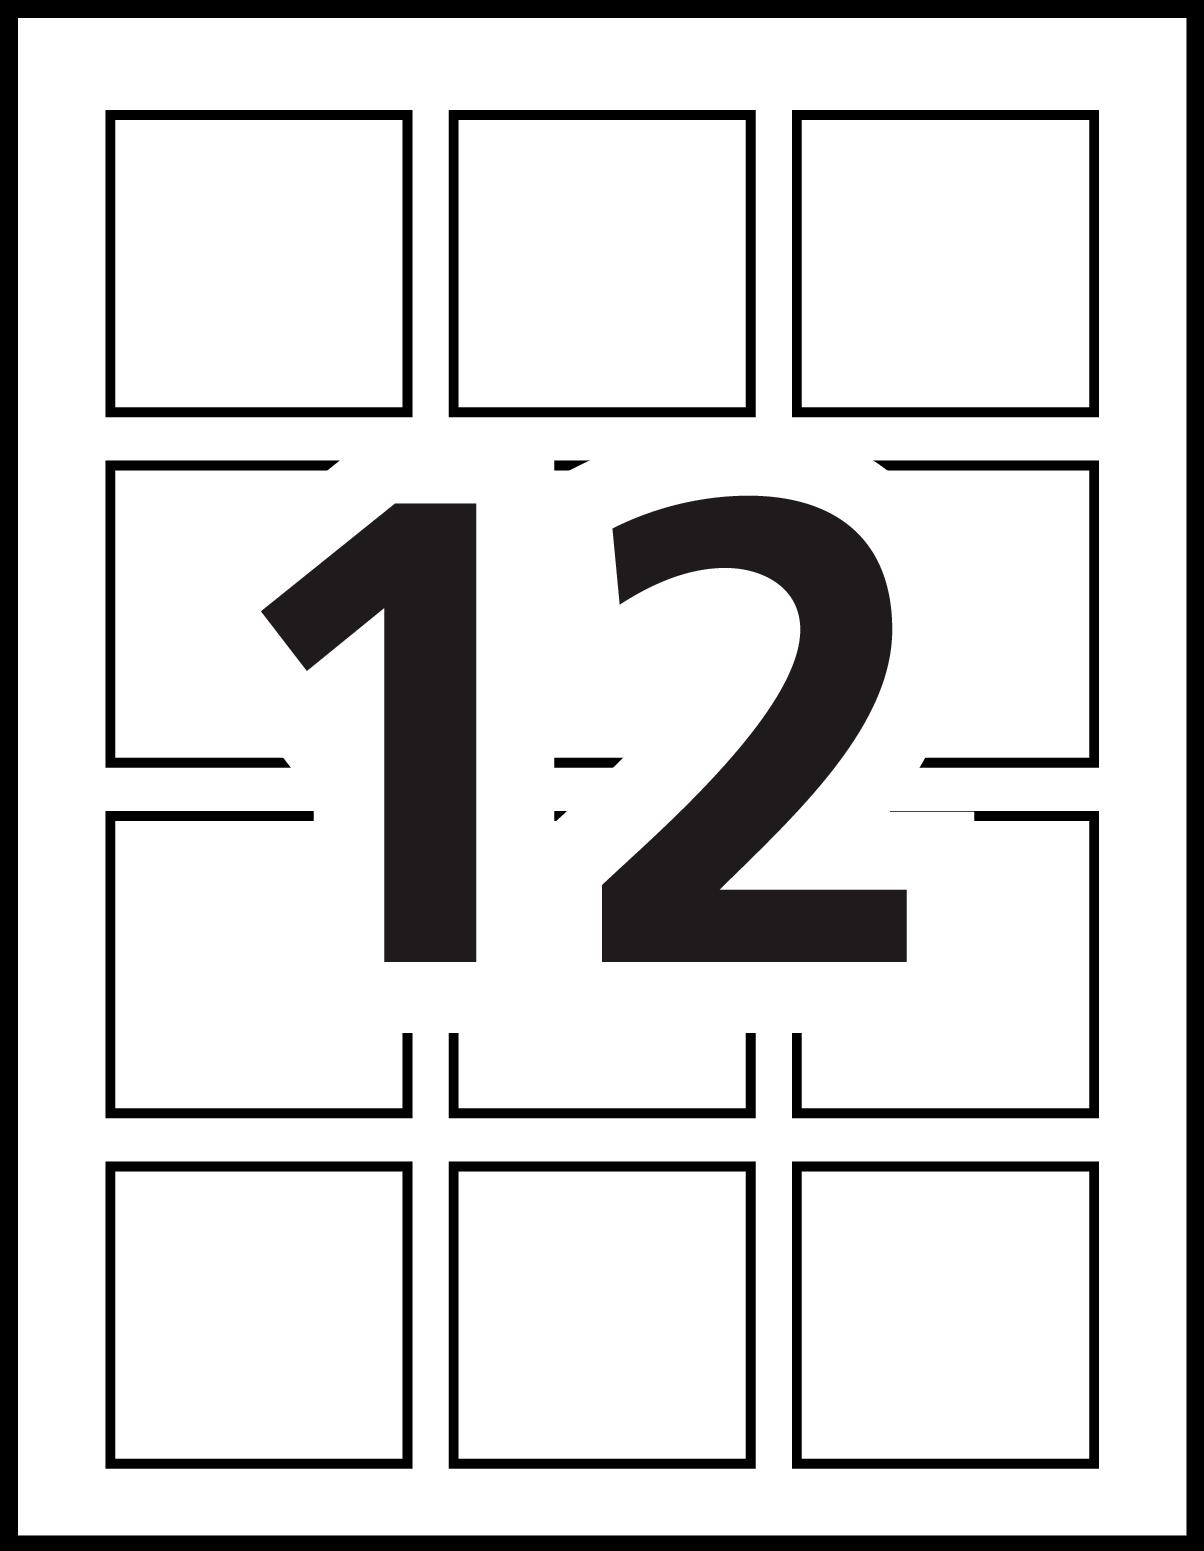 Lujo plantilla avery 8859 imagen ejemplo de currculum comercial stunning avery business card template 8859 contemporary business vistoso plantilla avery 8859 vieta ejemplo de currculum accmission Choice Image